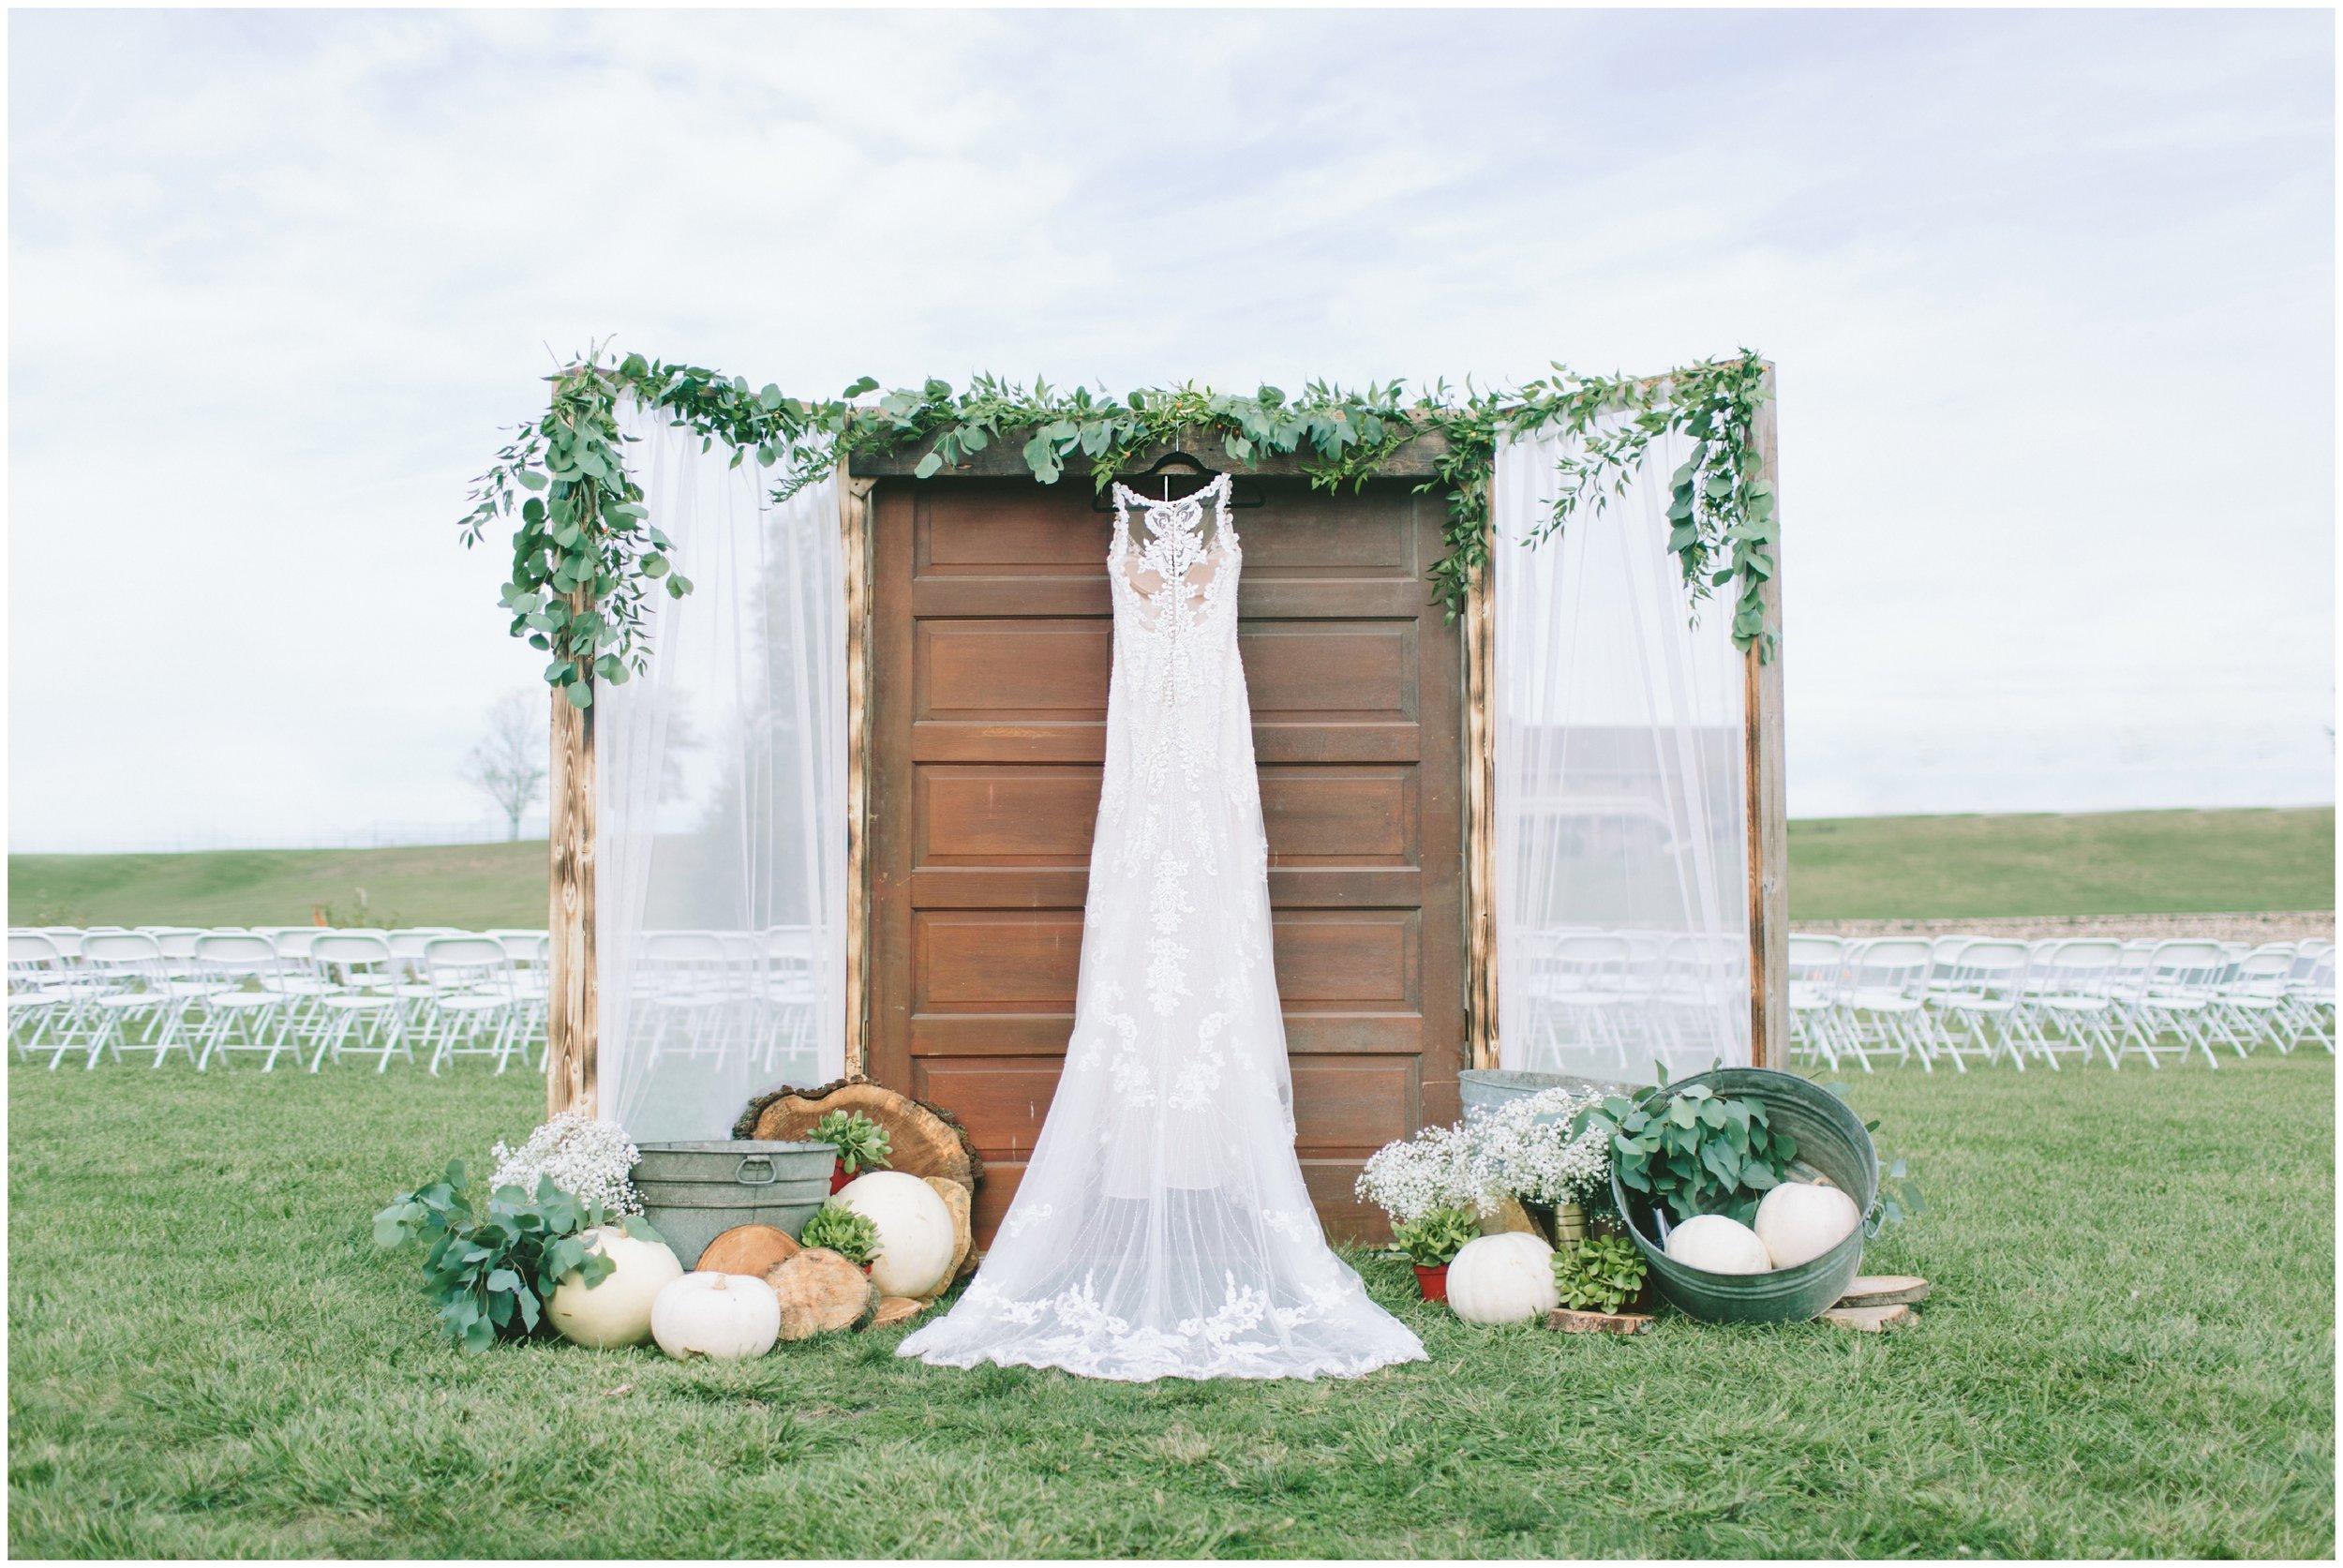 Indiana Wedding 1.JPG